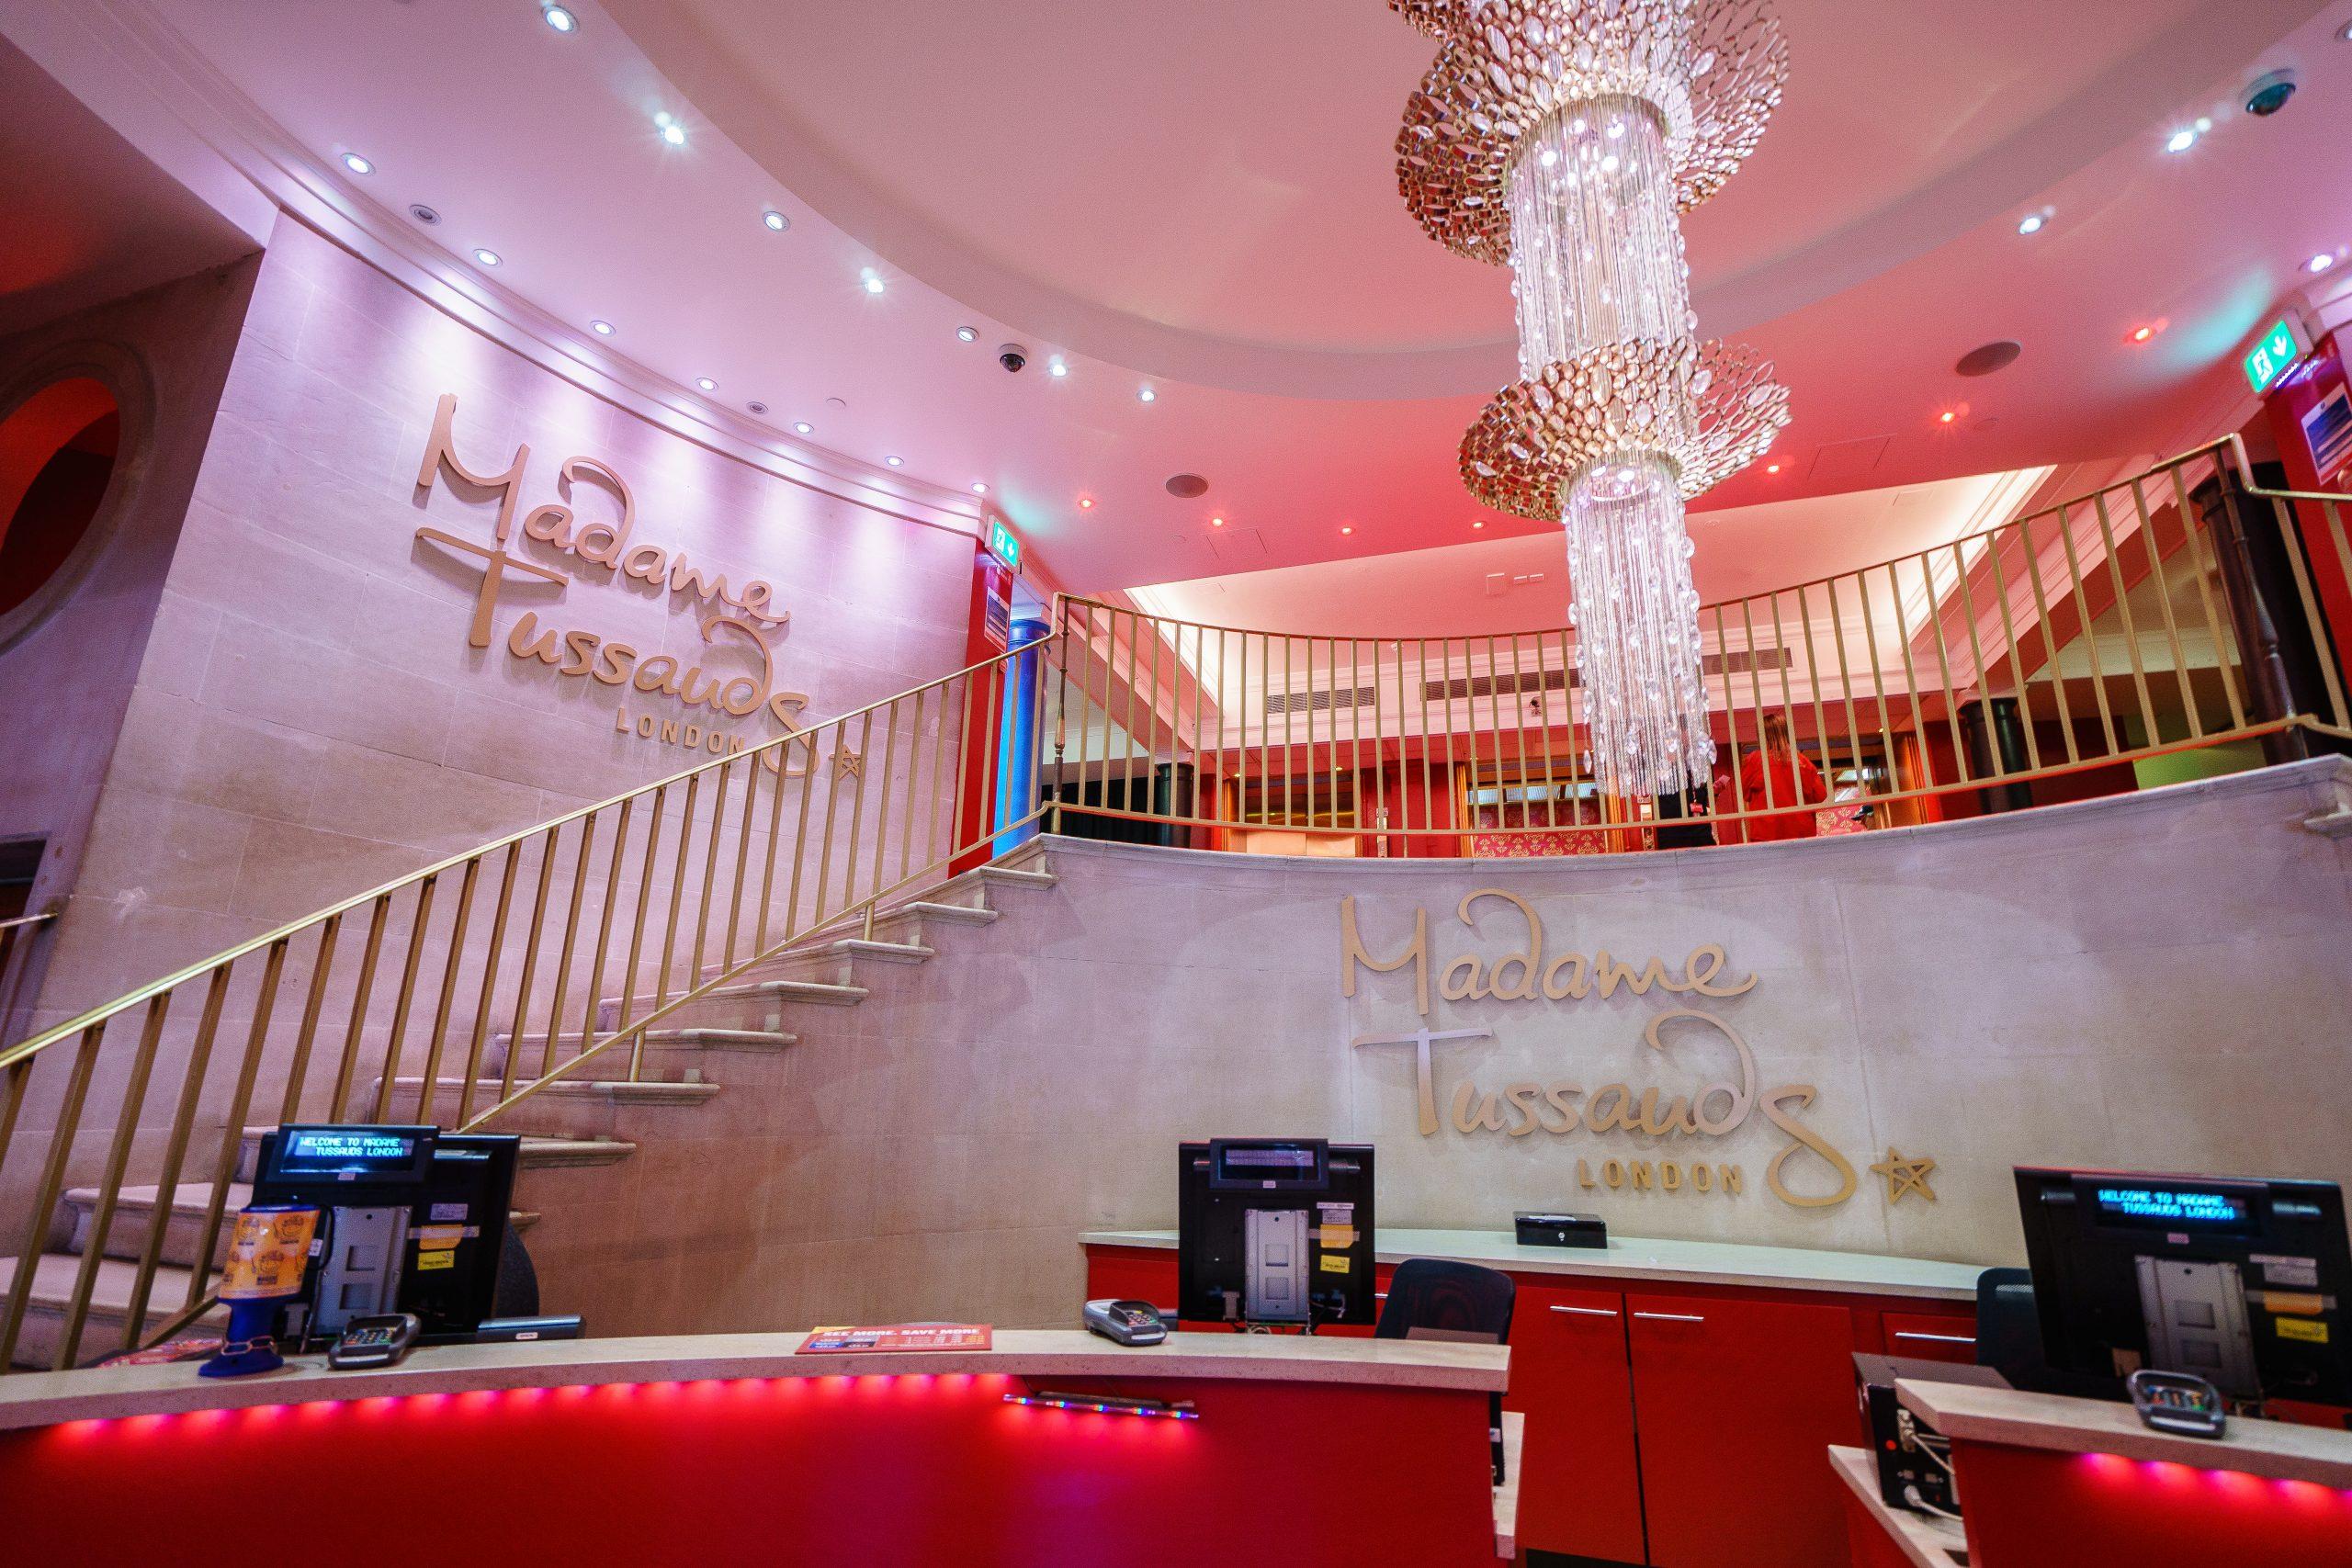 Madame Tussauds London entrance